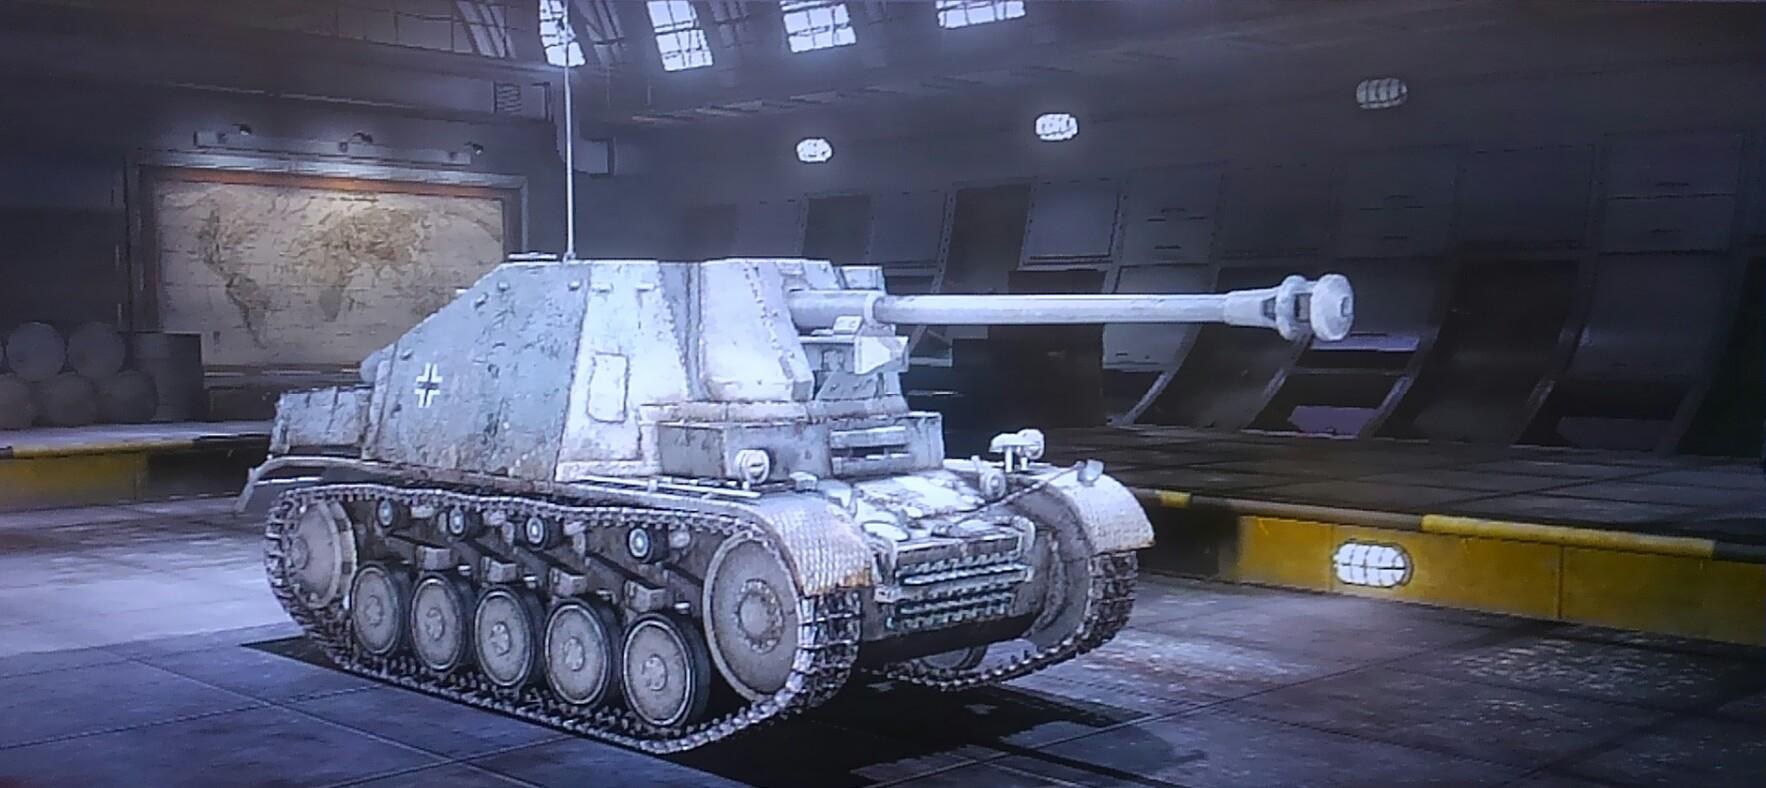 3_7.5cm_Pak40.2_auf_F.Pz.II.jpg